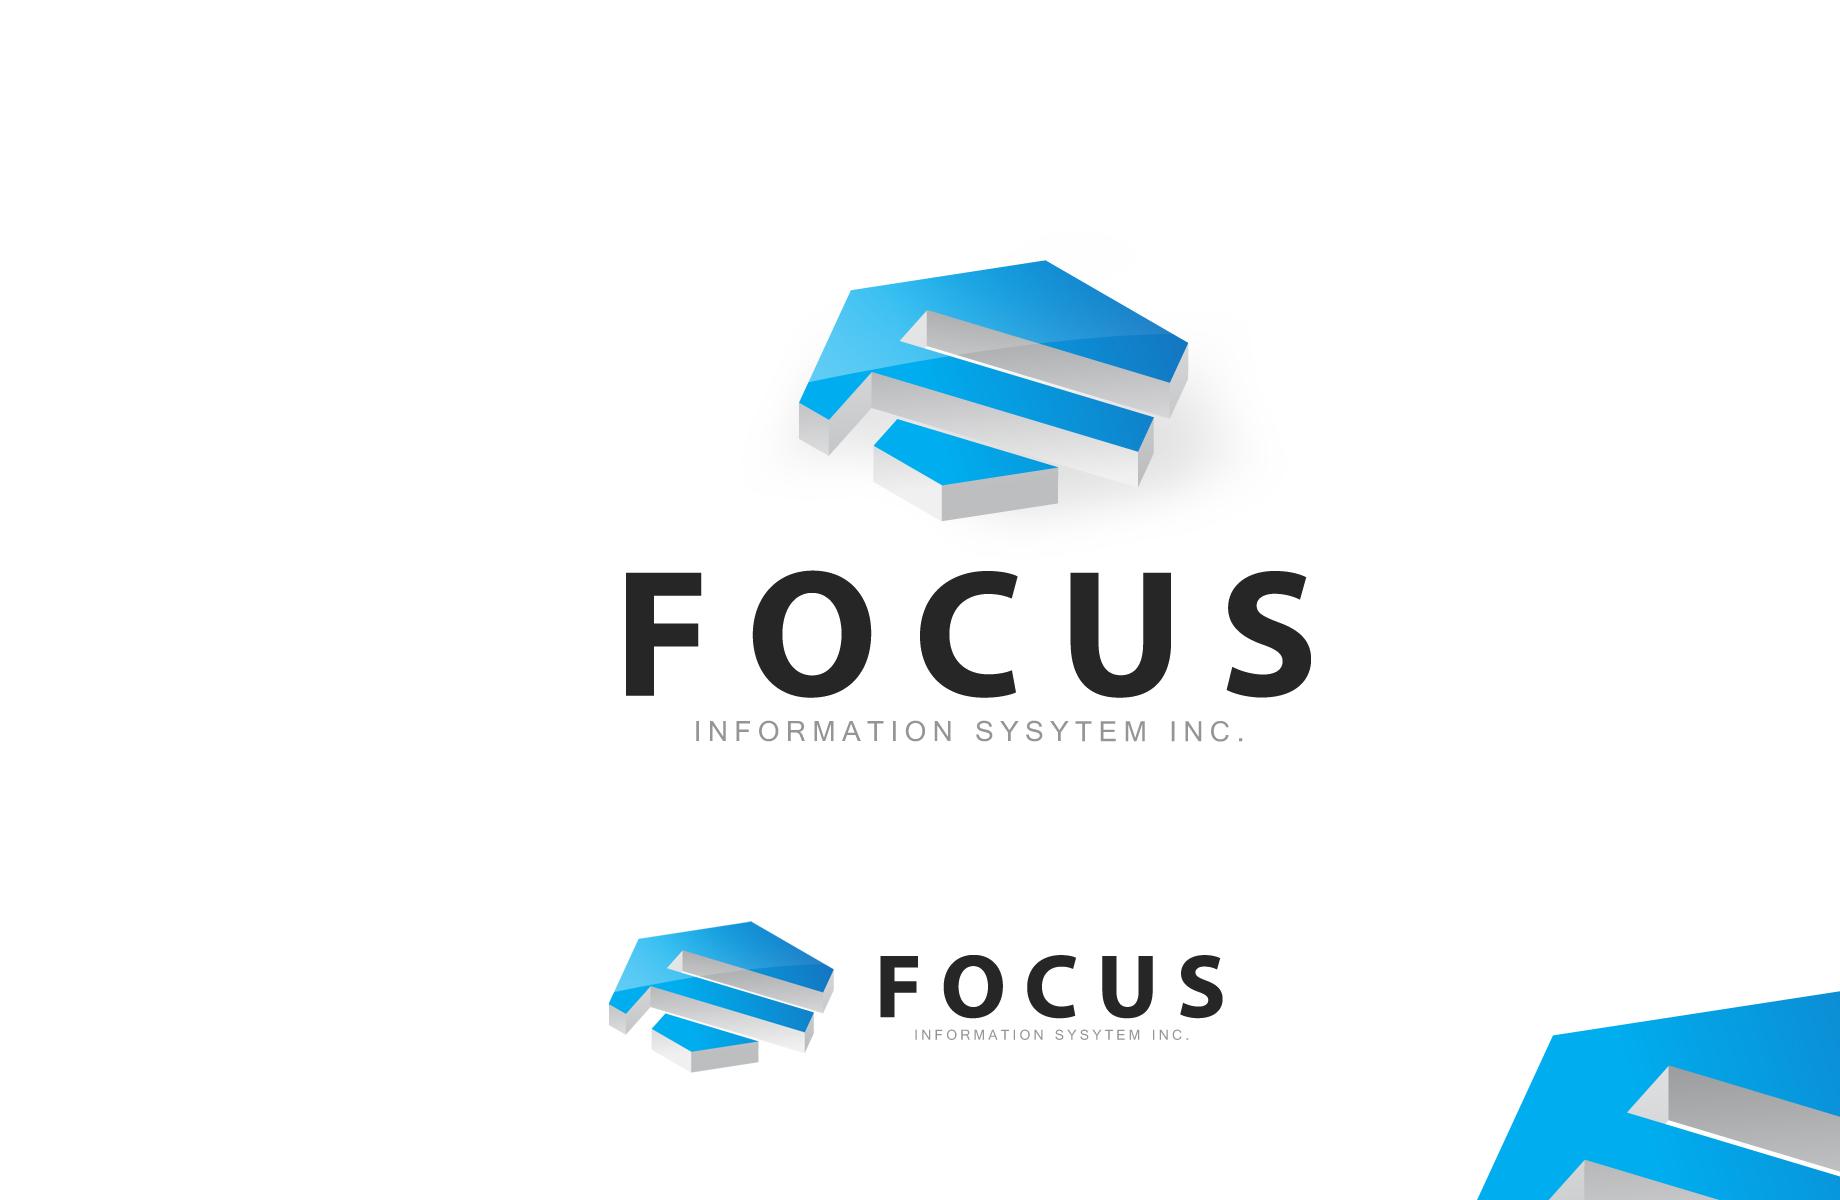 Logo Design by Jan Chua - Entry No. 57 in the Logo Design Contest Artistic Logo Design for Focus Information Systems, Inc..